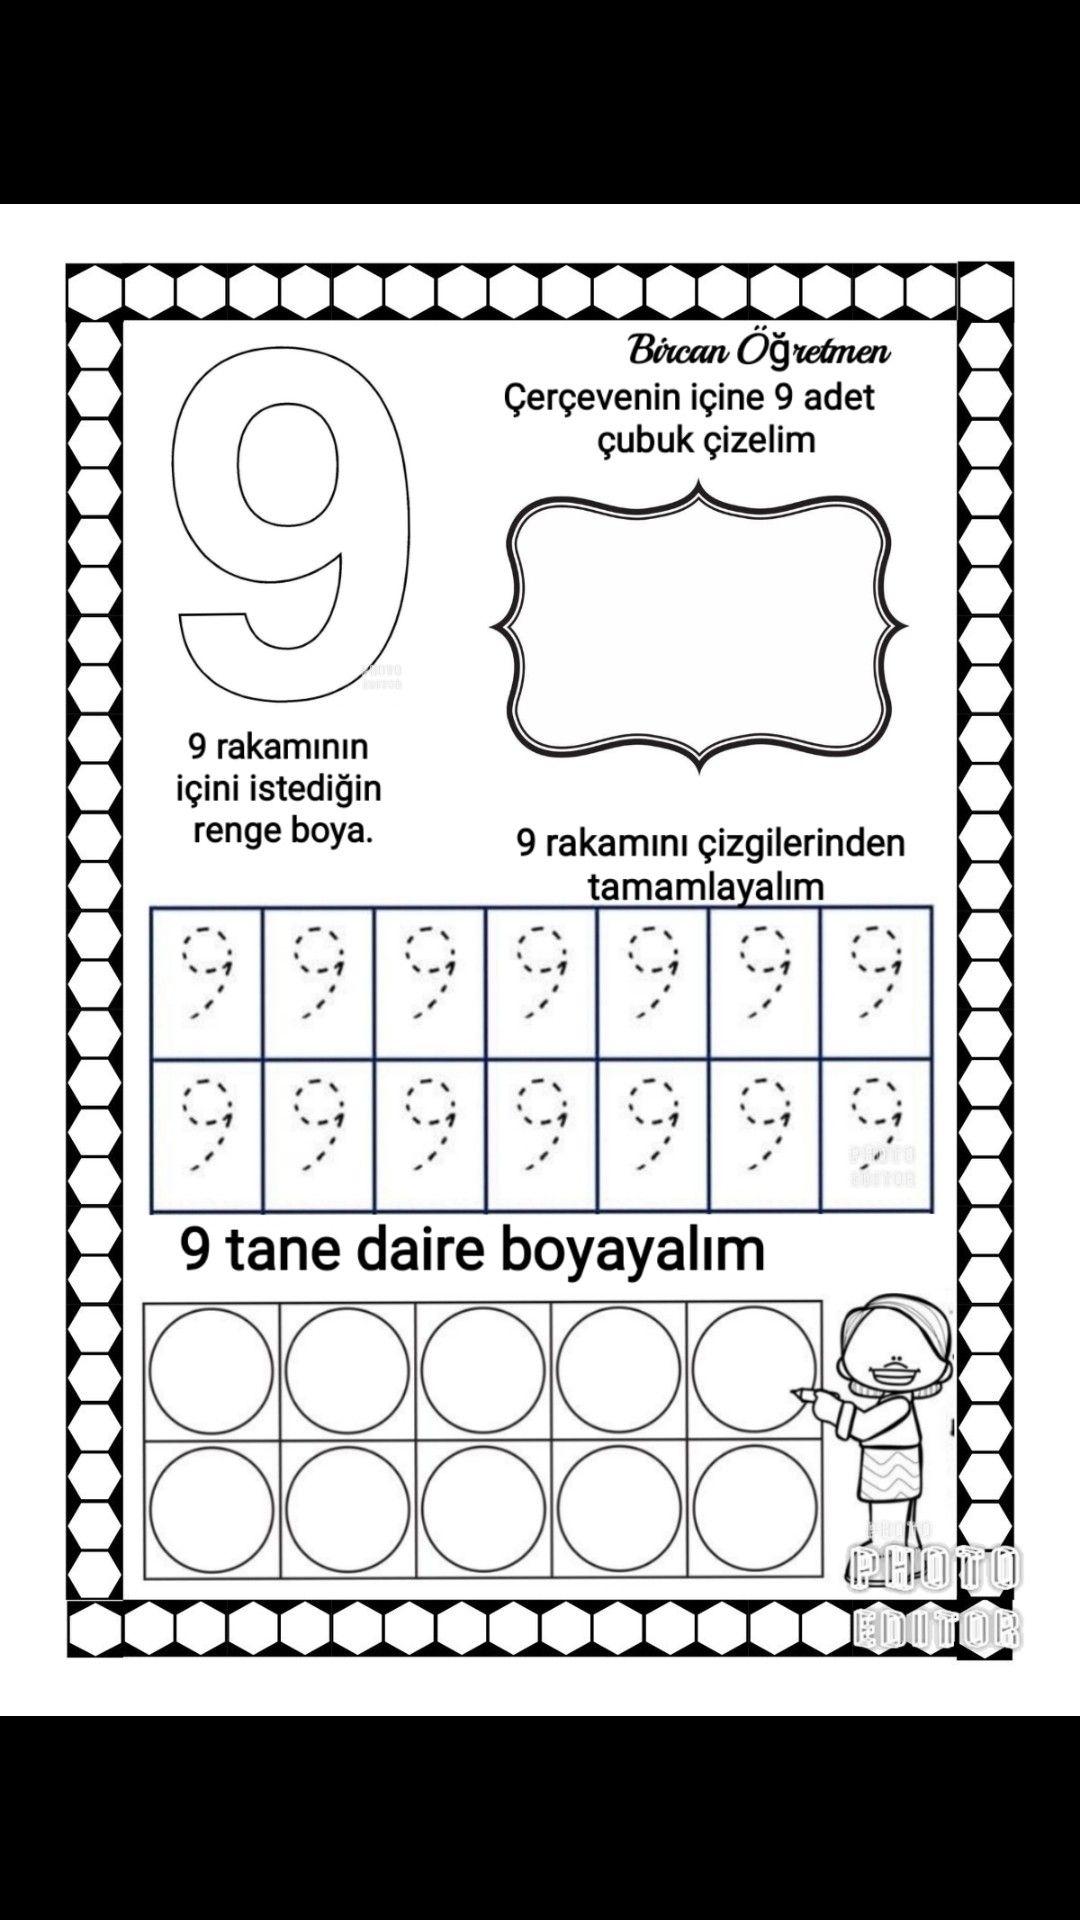 9 Rakami Calismasi 1 Sinif Matematik Anaokulu Matematigi